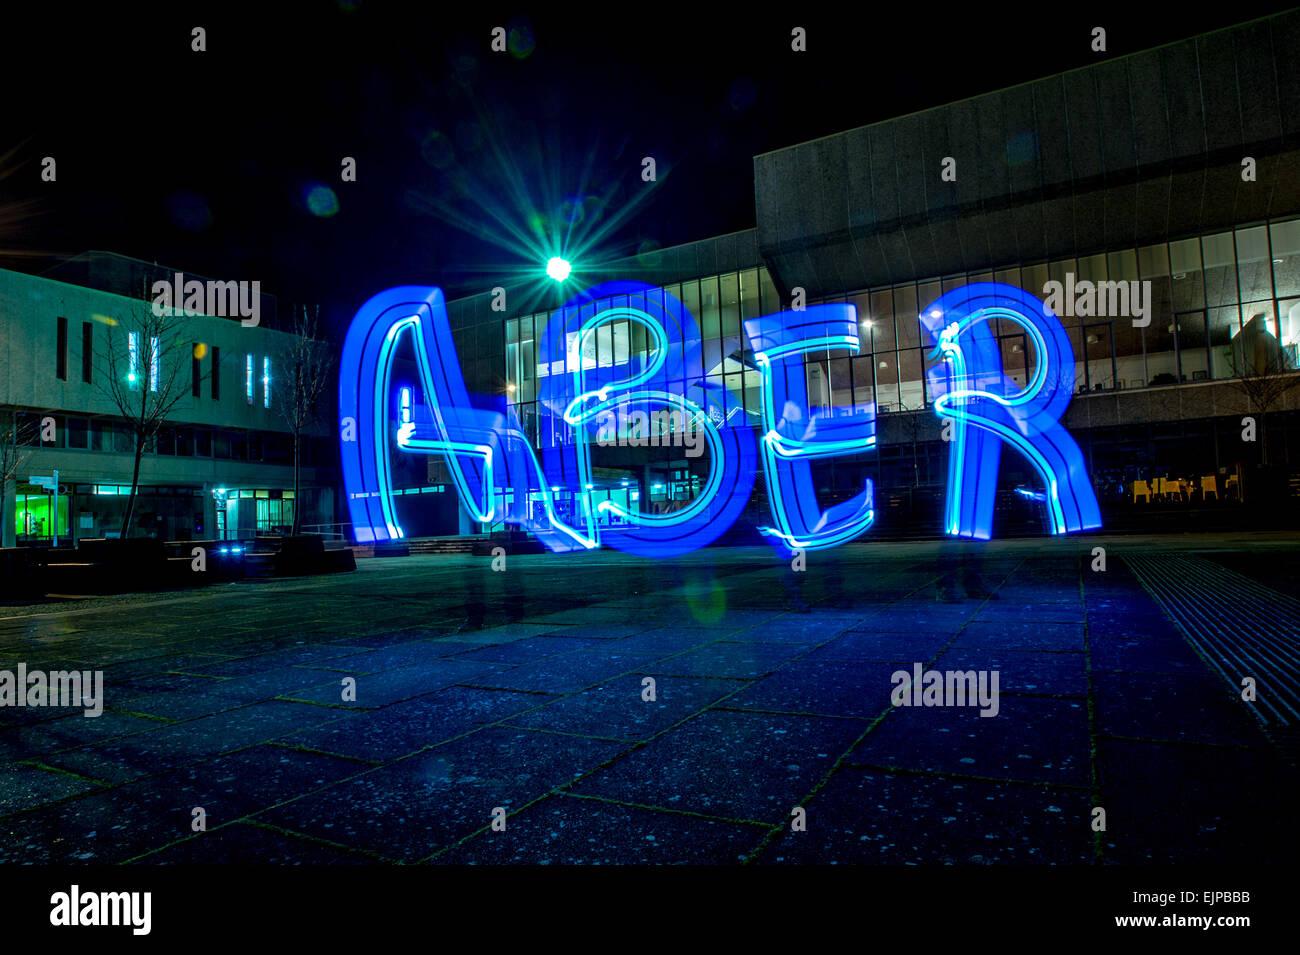 "Lightbombing / luce pittura - la parola ""aber' dipinta in luce al di fuori Aberystwyth Arts Center di notte Wales UK Foto Stock"